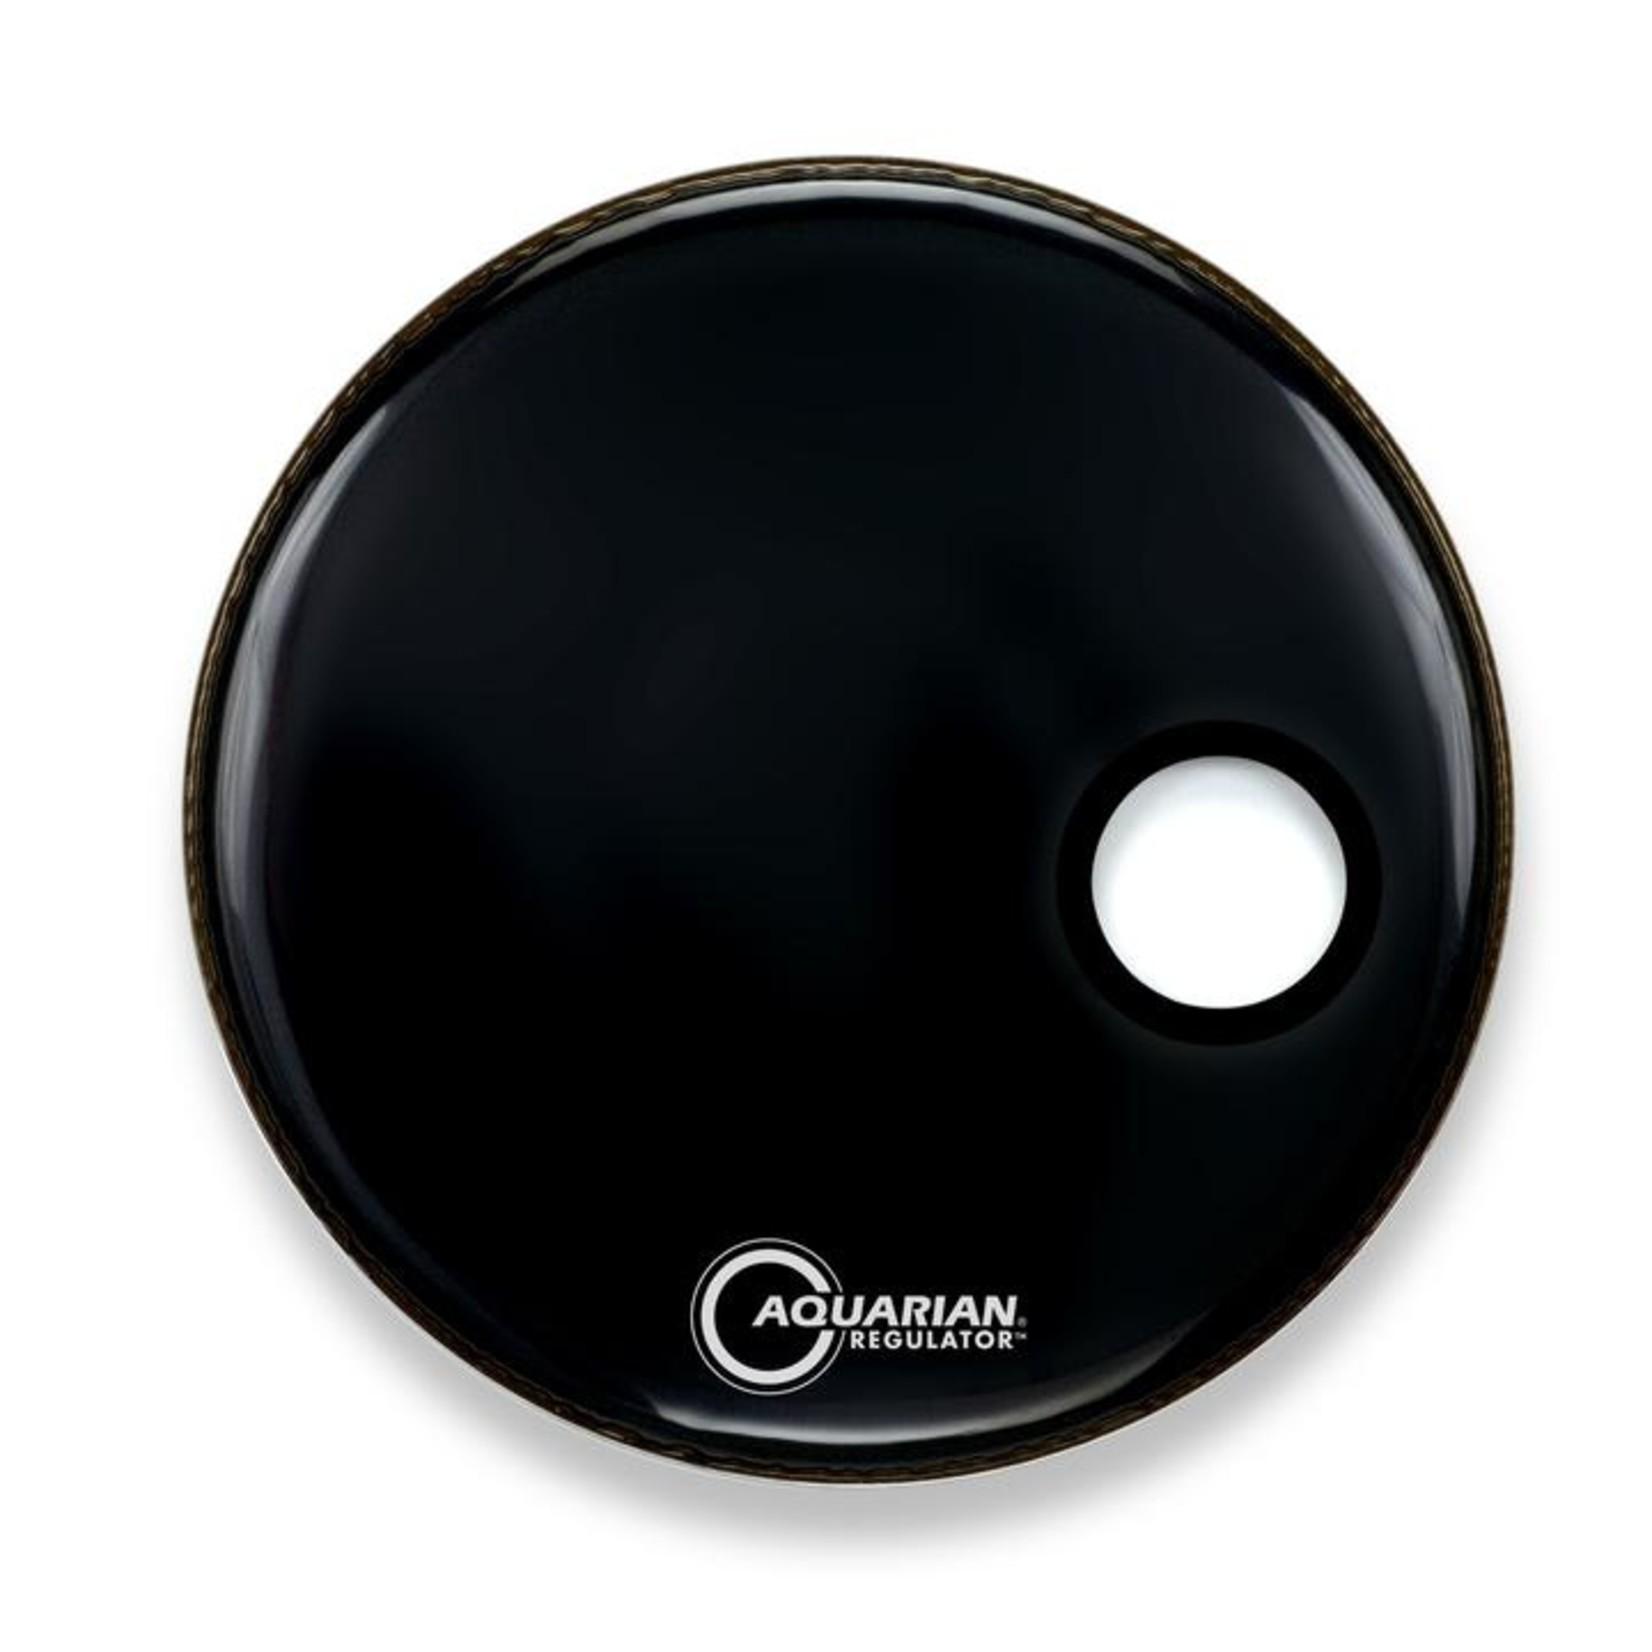 "Aquarian Aquarian Regulator Black Video Gloss Bass Drum w/ 4.75"" Offset Hole"